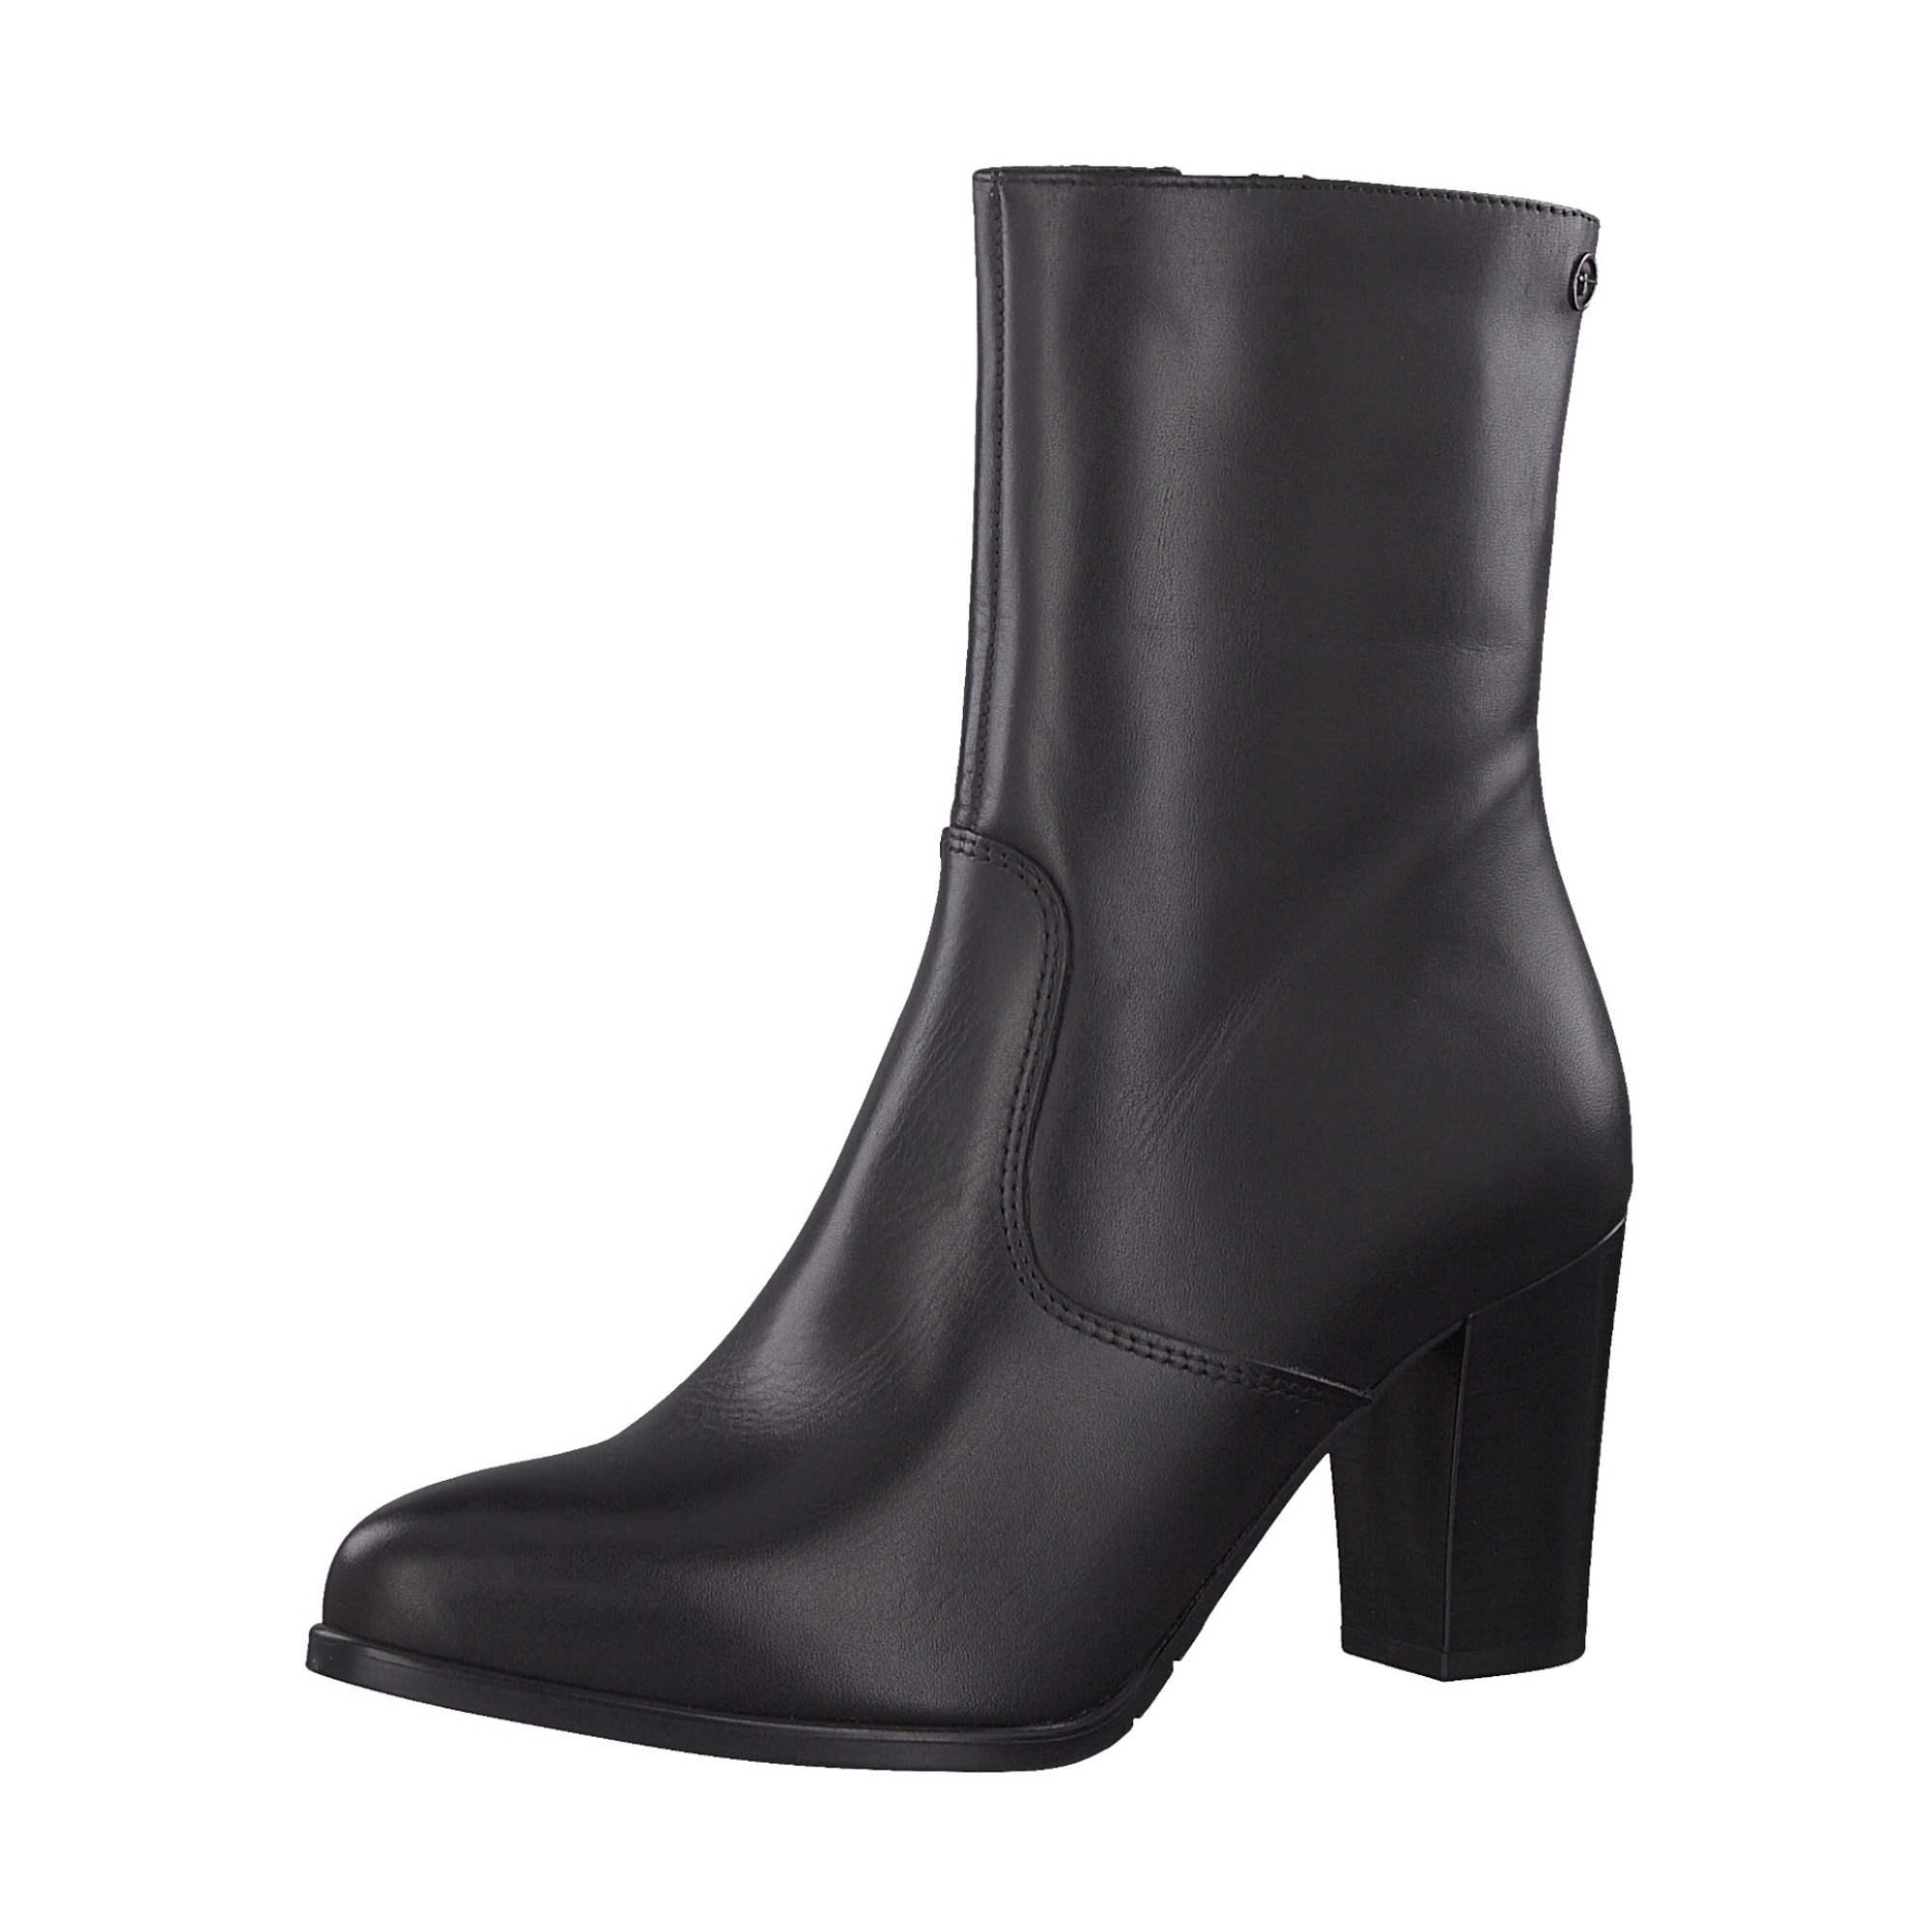 4bf35ce6a5 detail Dámská obuv TAMARIS 1-1-25382-31 BLACK LEATHER 003